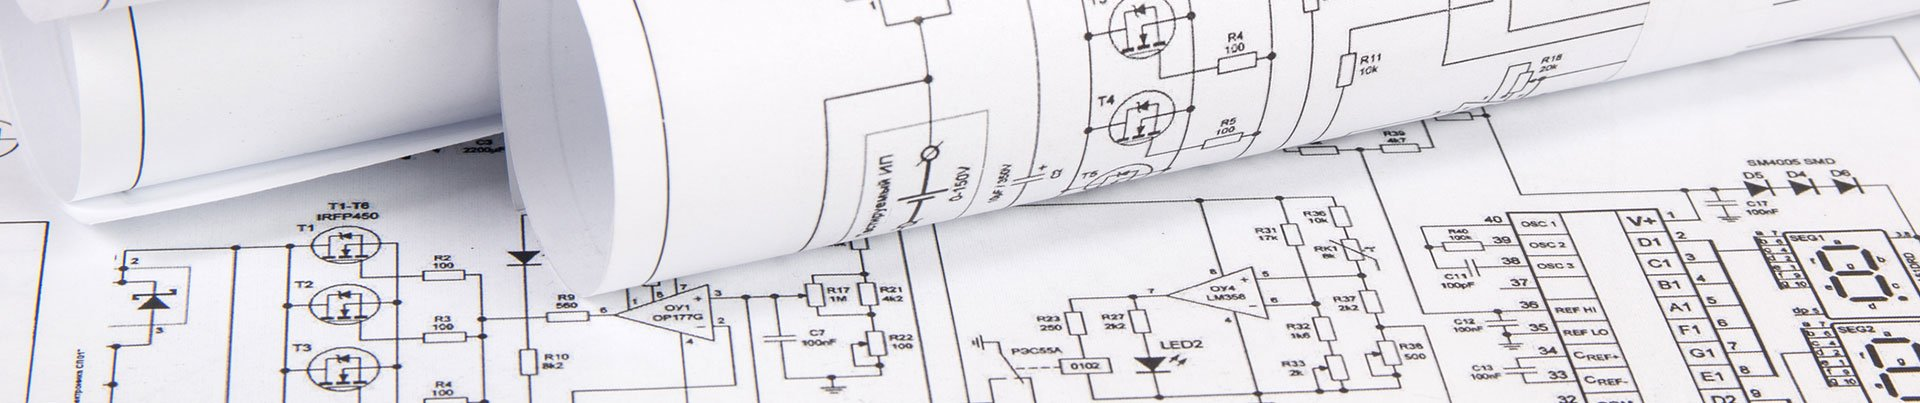 building schematics and designs